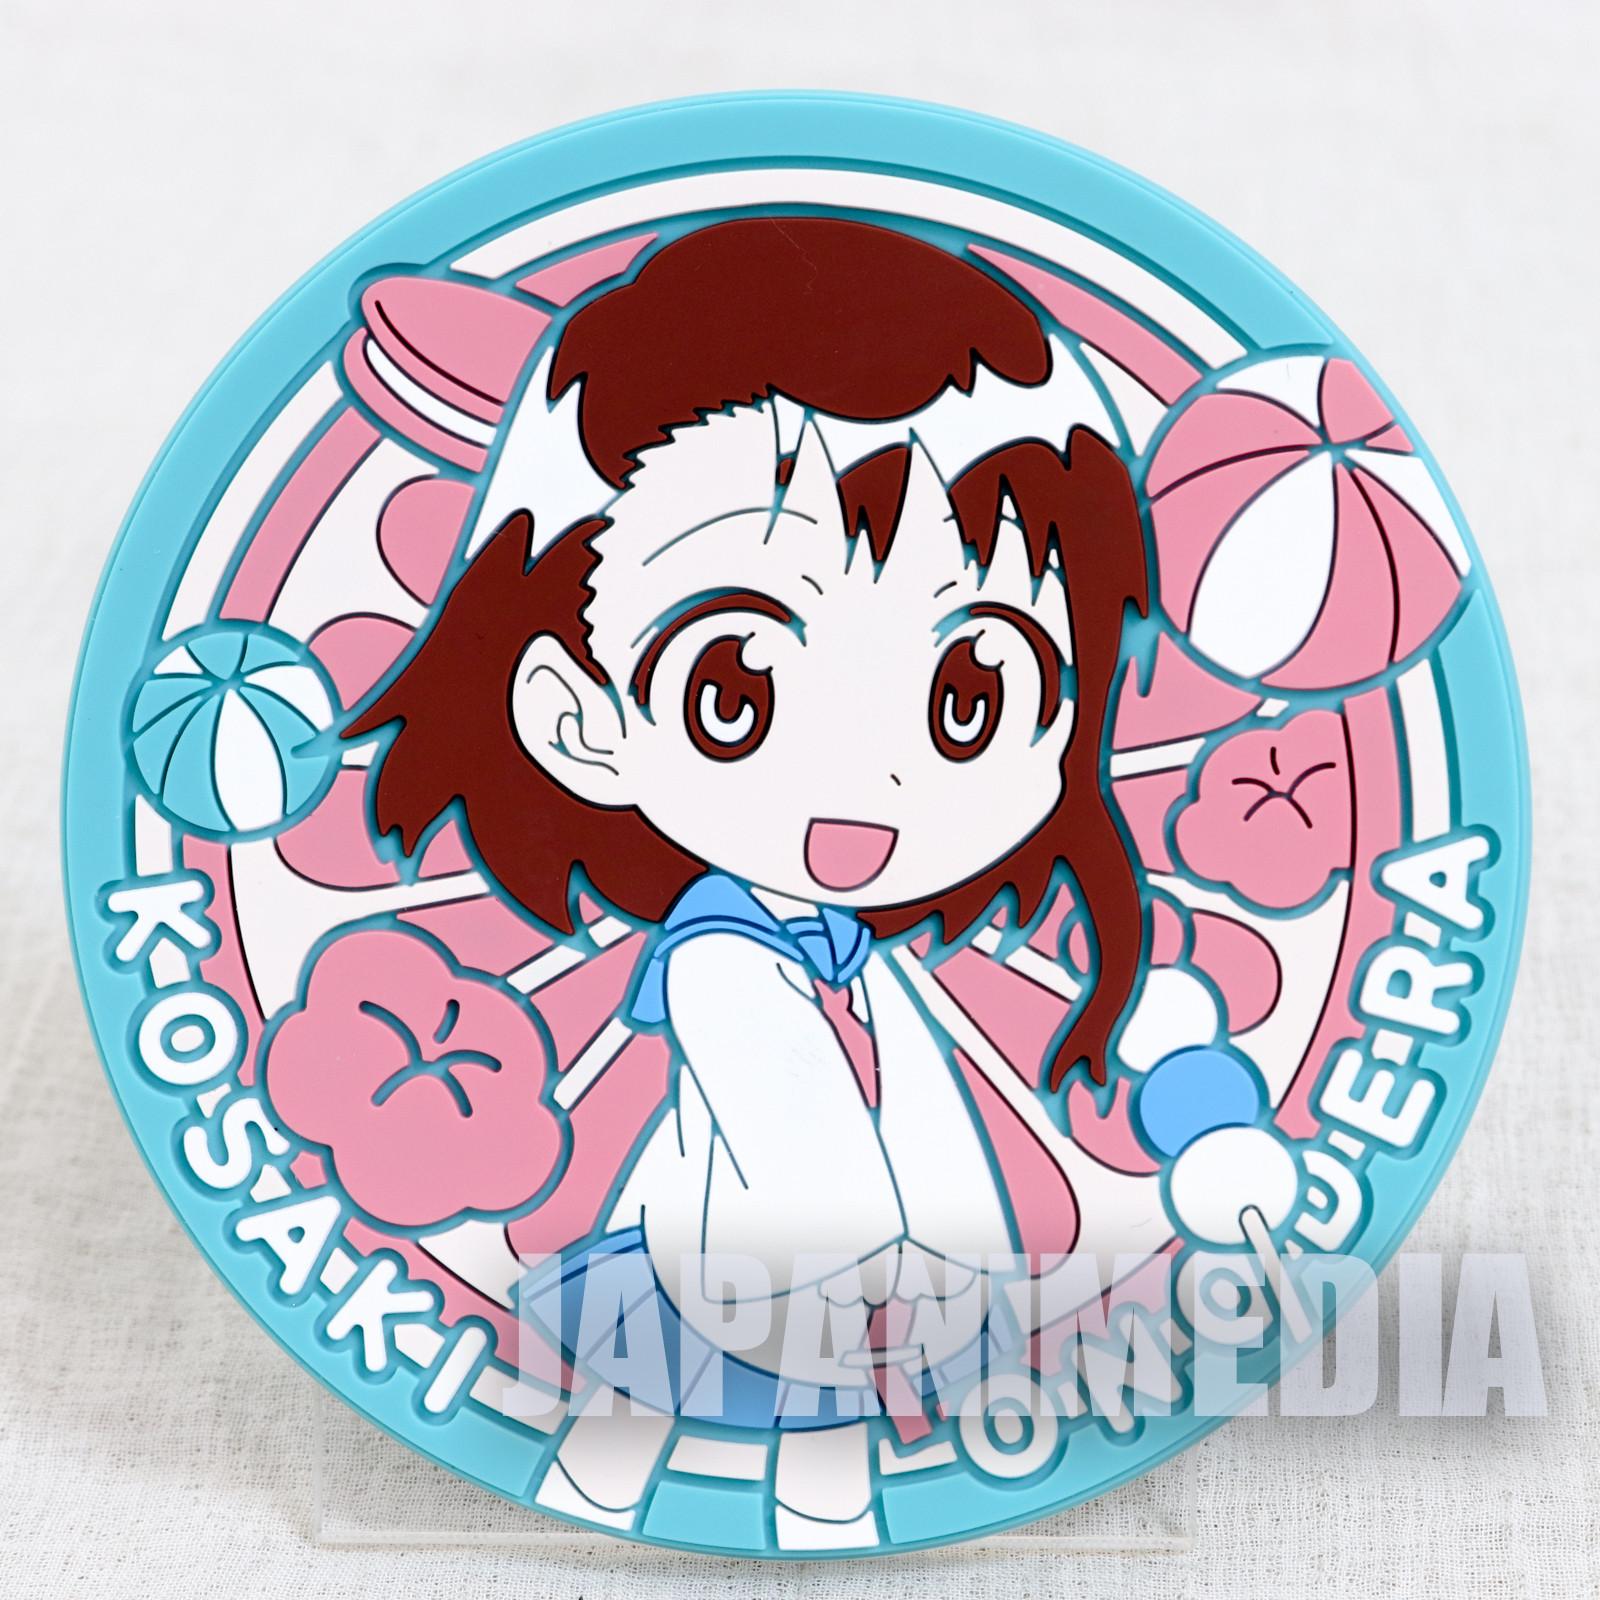 RARE! Nisekoi Rubber Coaster Kosaki Onodera JAPAN ANIME